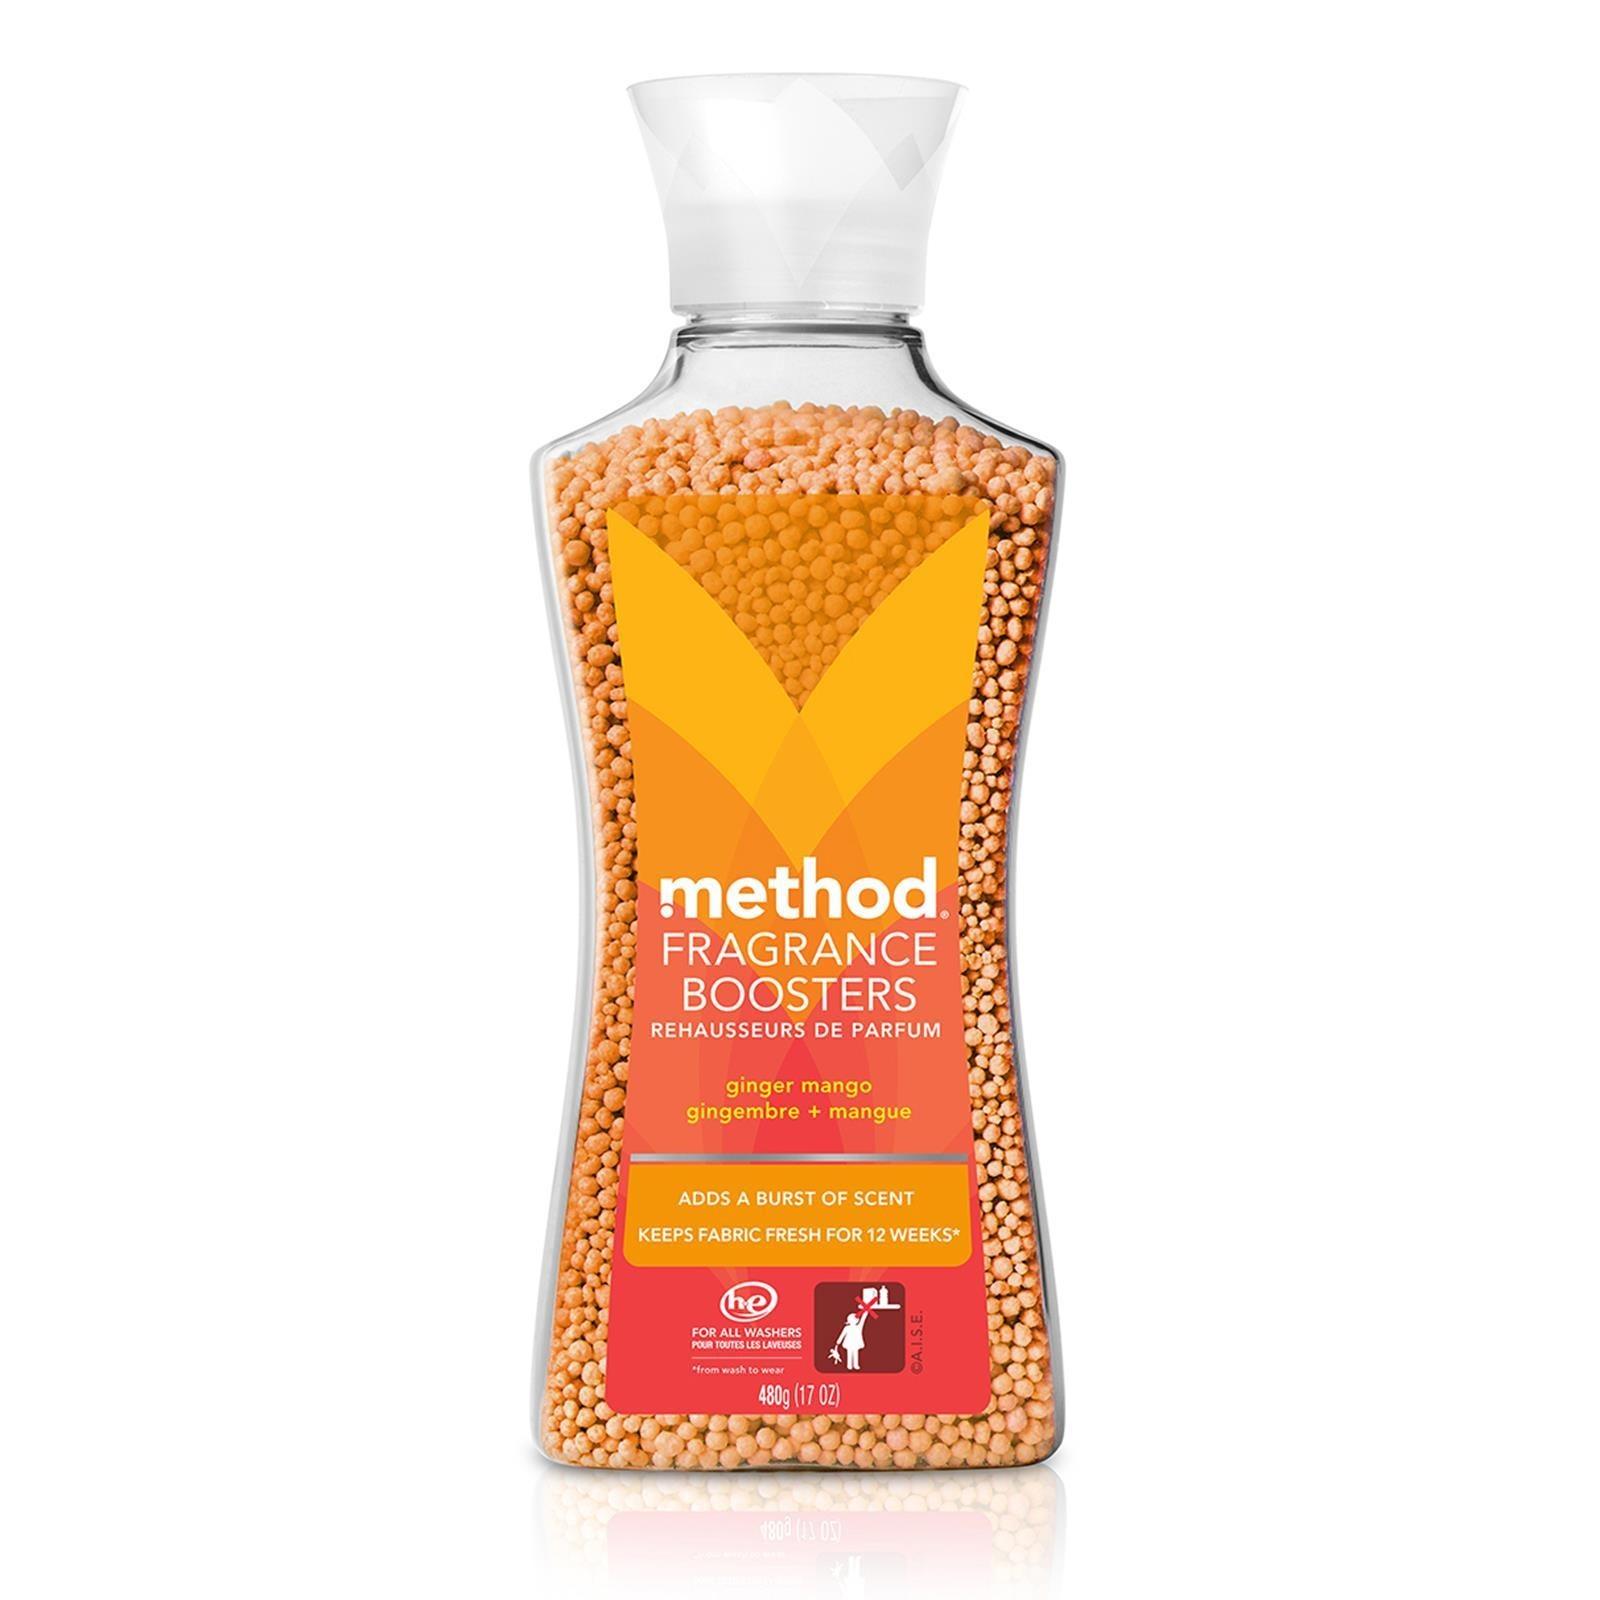 Method Fragrance Boosters - Ginger Mango